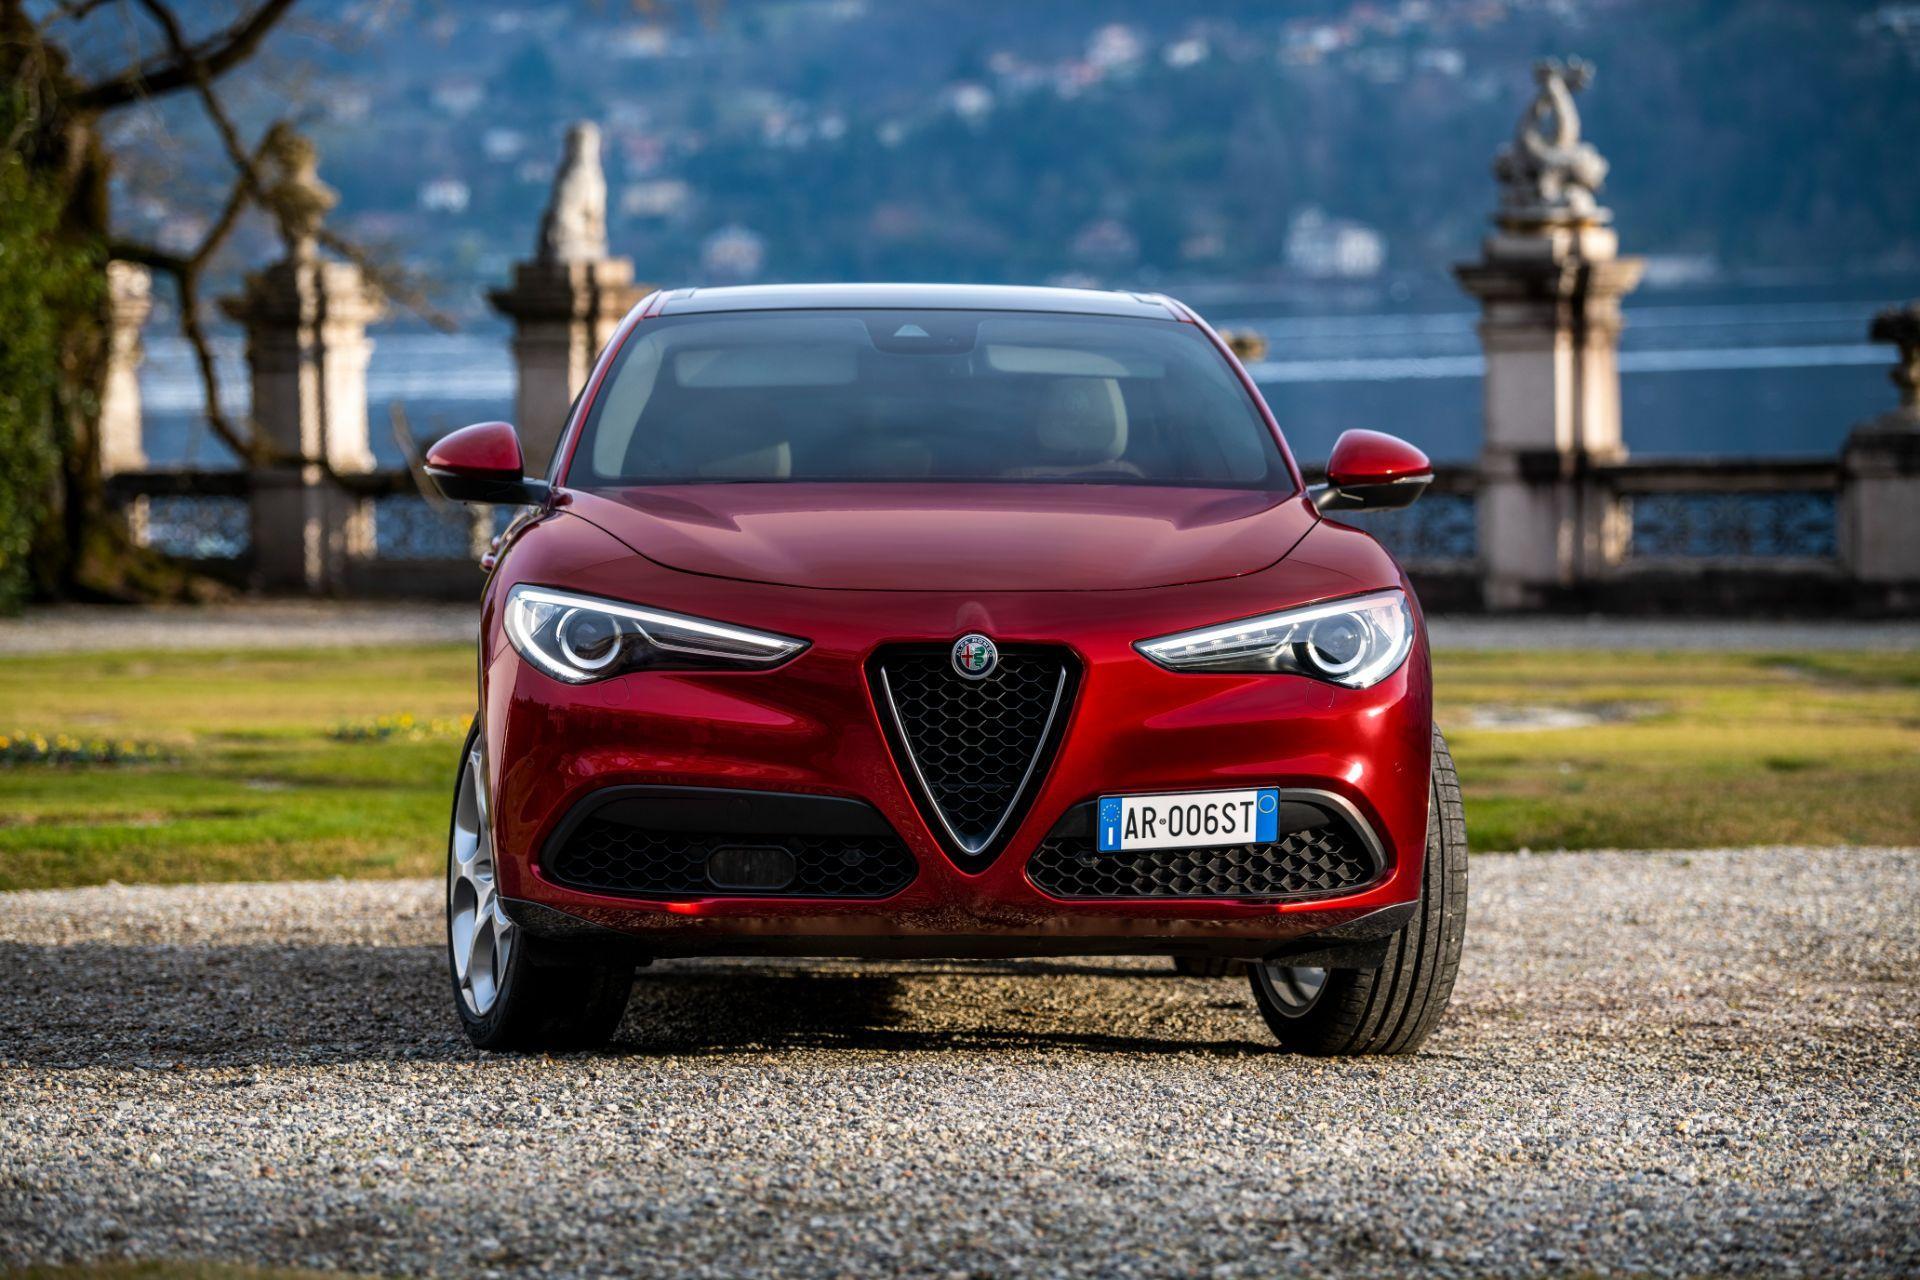 Alfa-Romeo-Giulia-and-Stelvio-6C-Villa-dEste-7